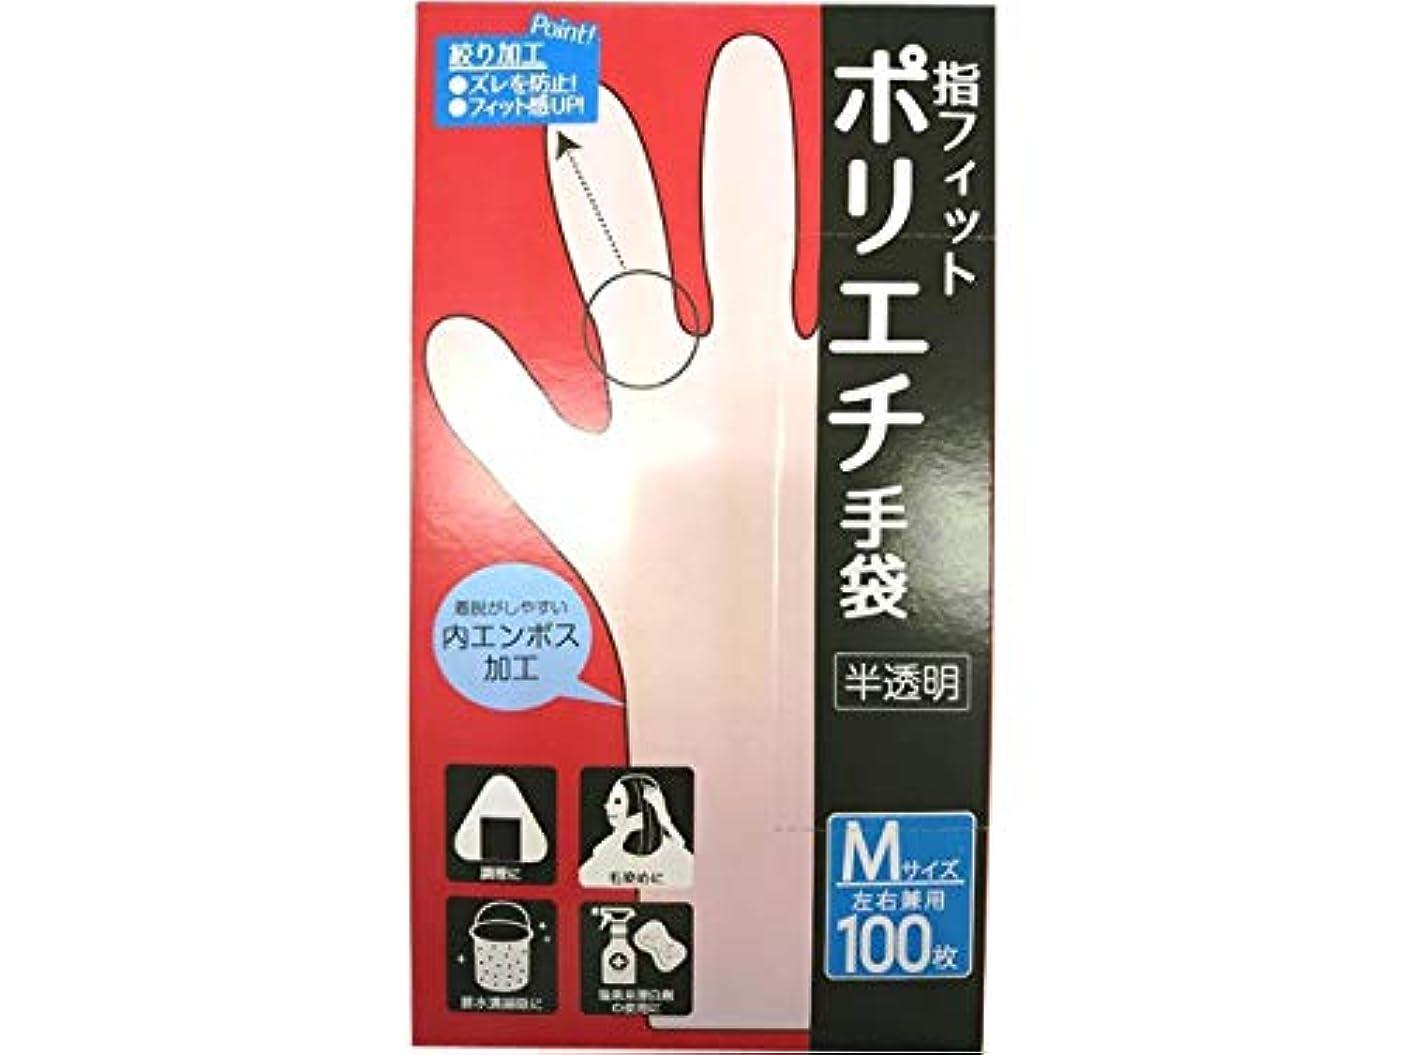 誰幸運な喉頭CS ポリエチ手袋 M 100P